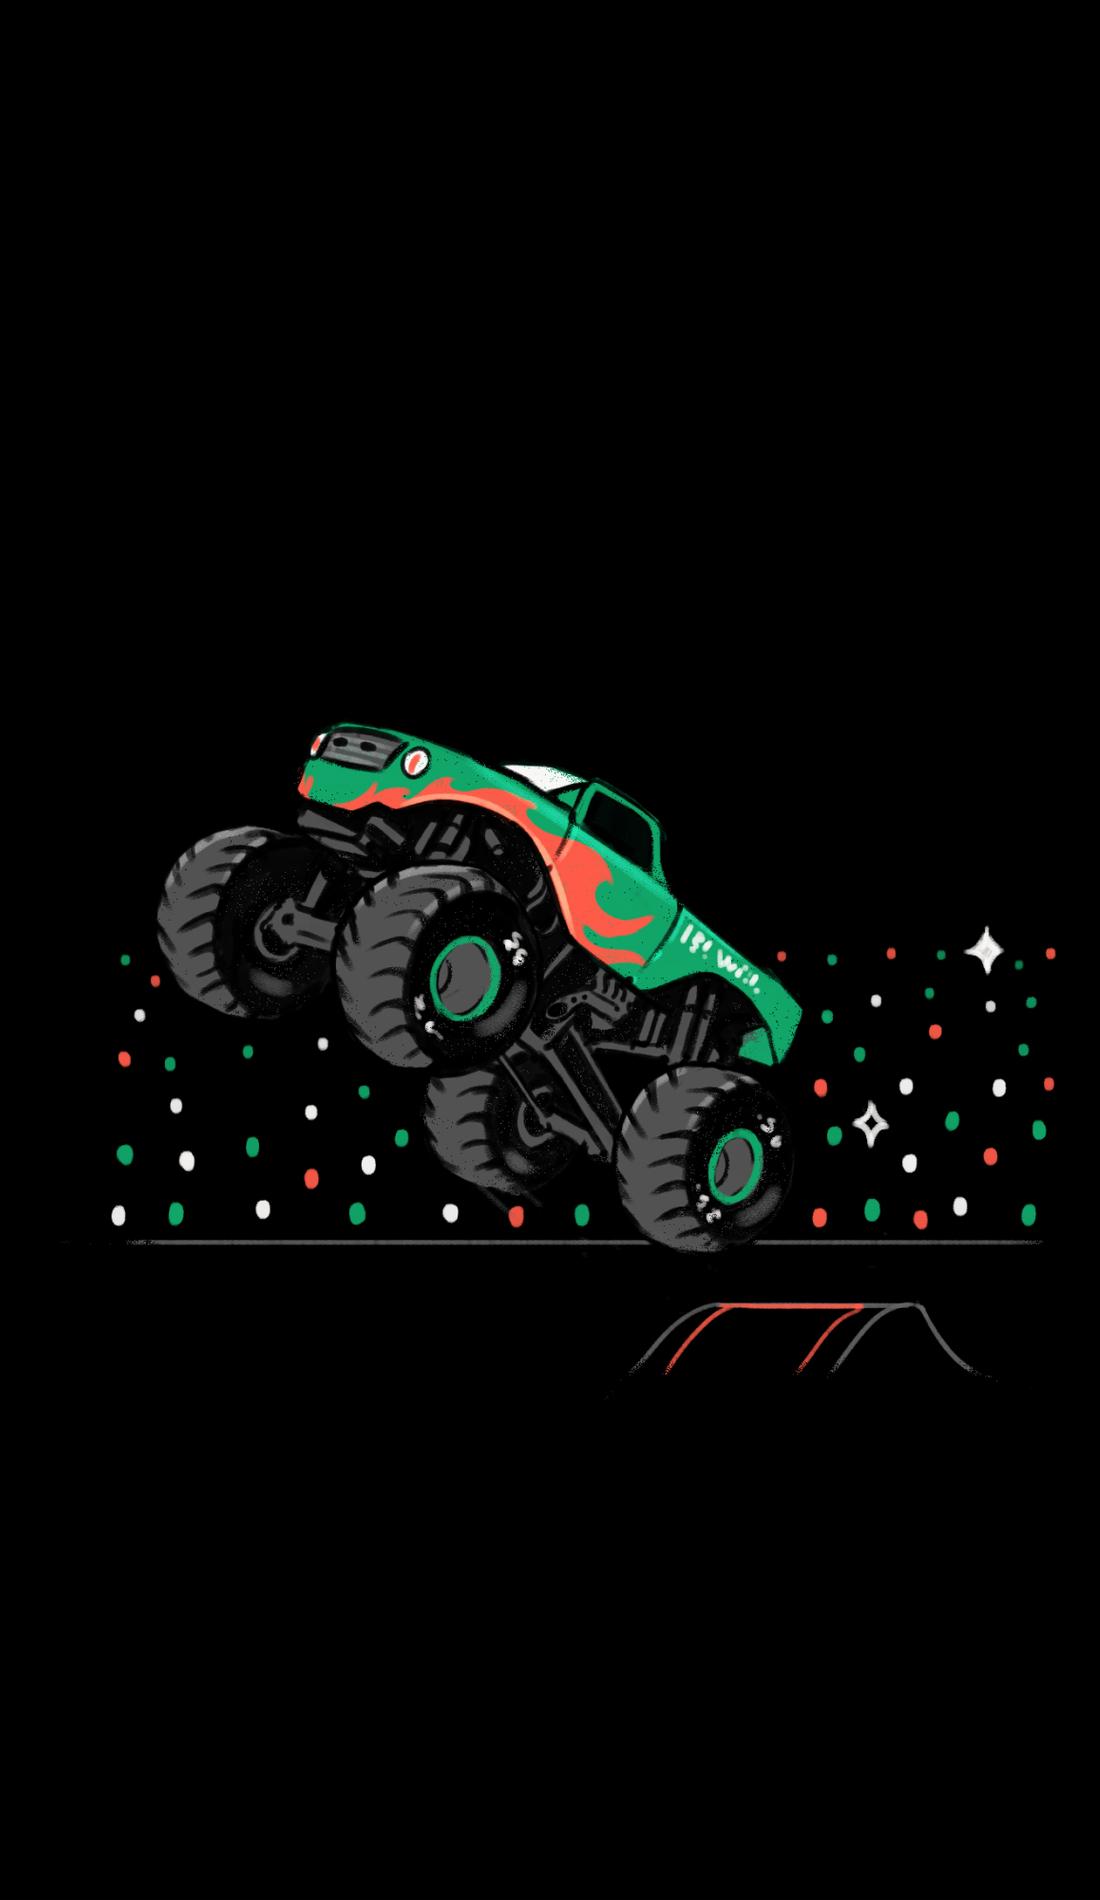 A Toughest Monster Trucks live event